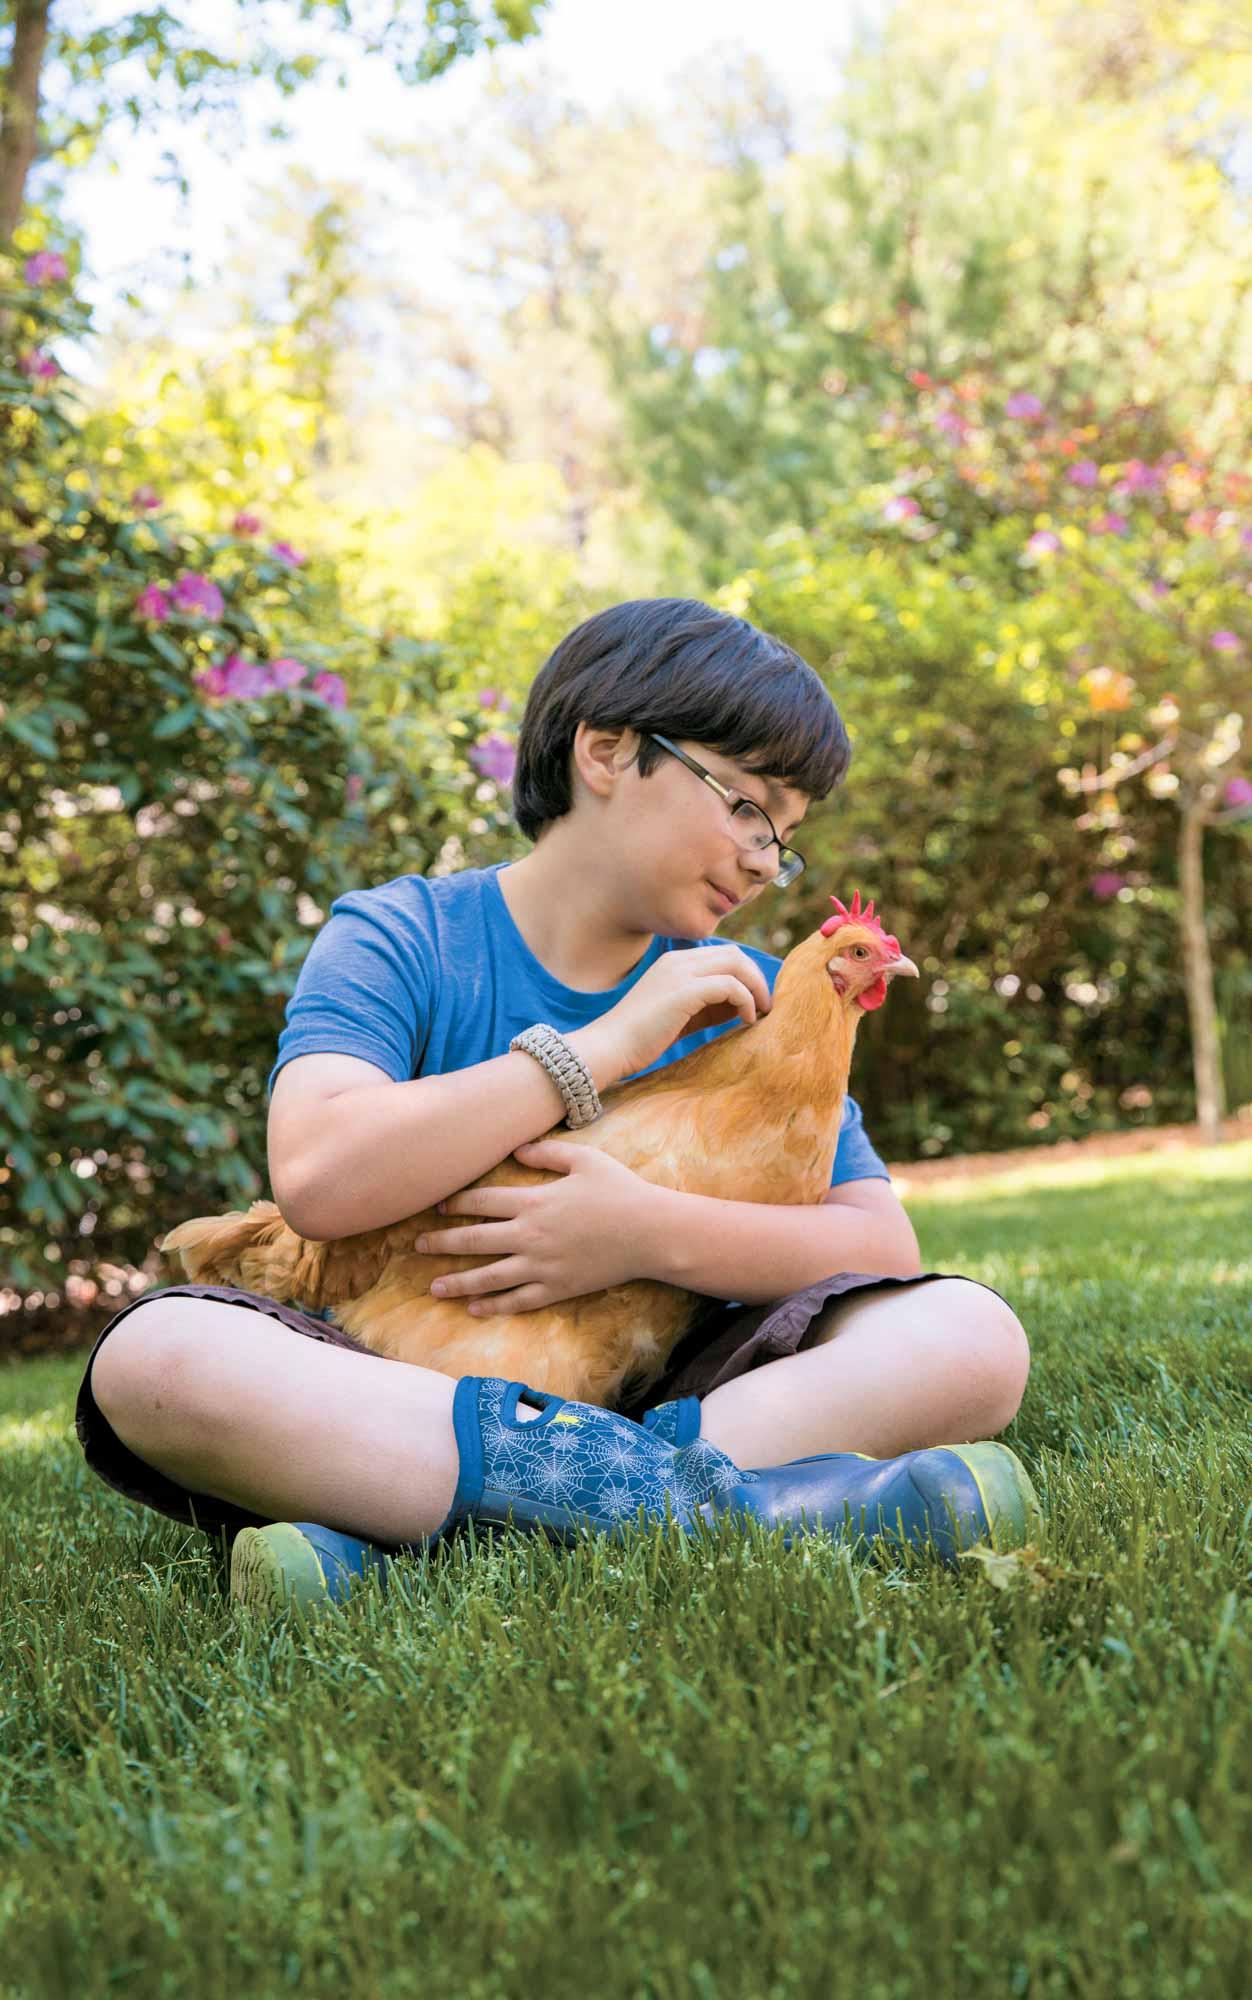 cKeller+Keller_kidsguidetokeepingchickens chickens kids